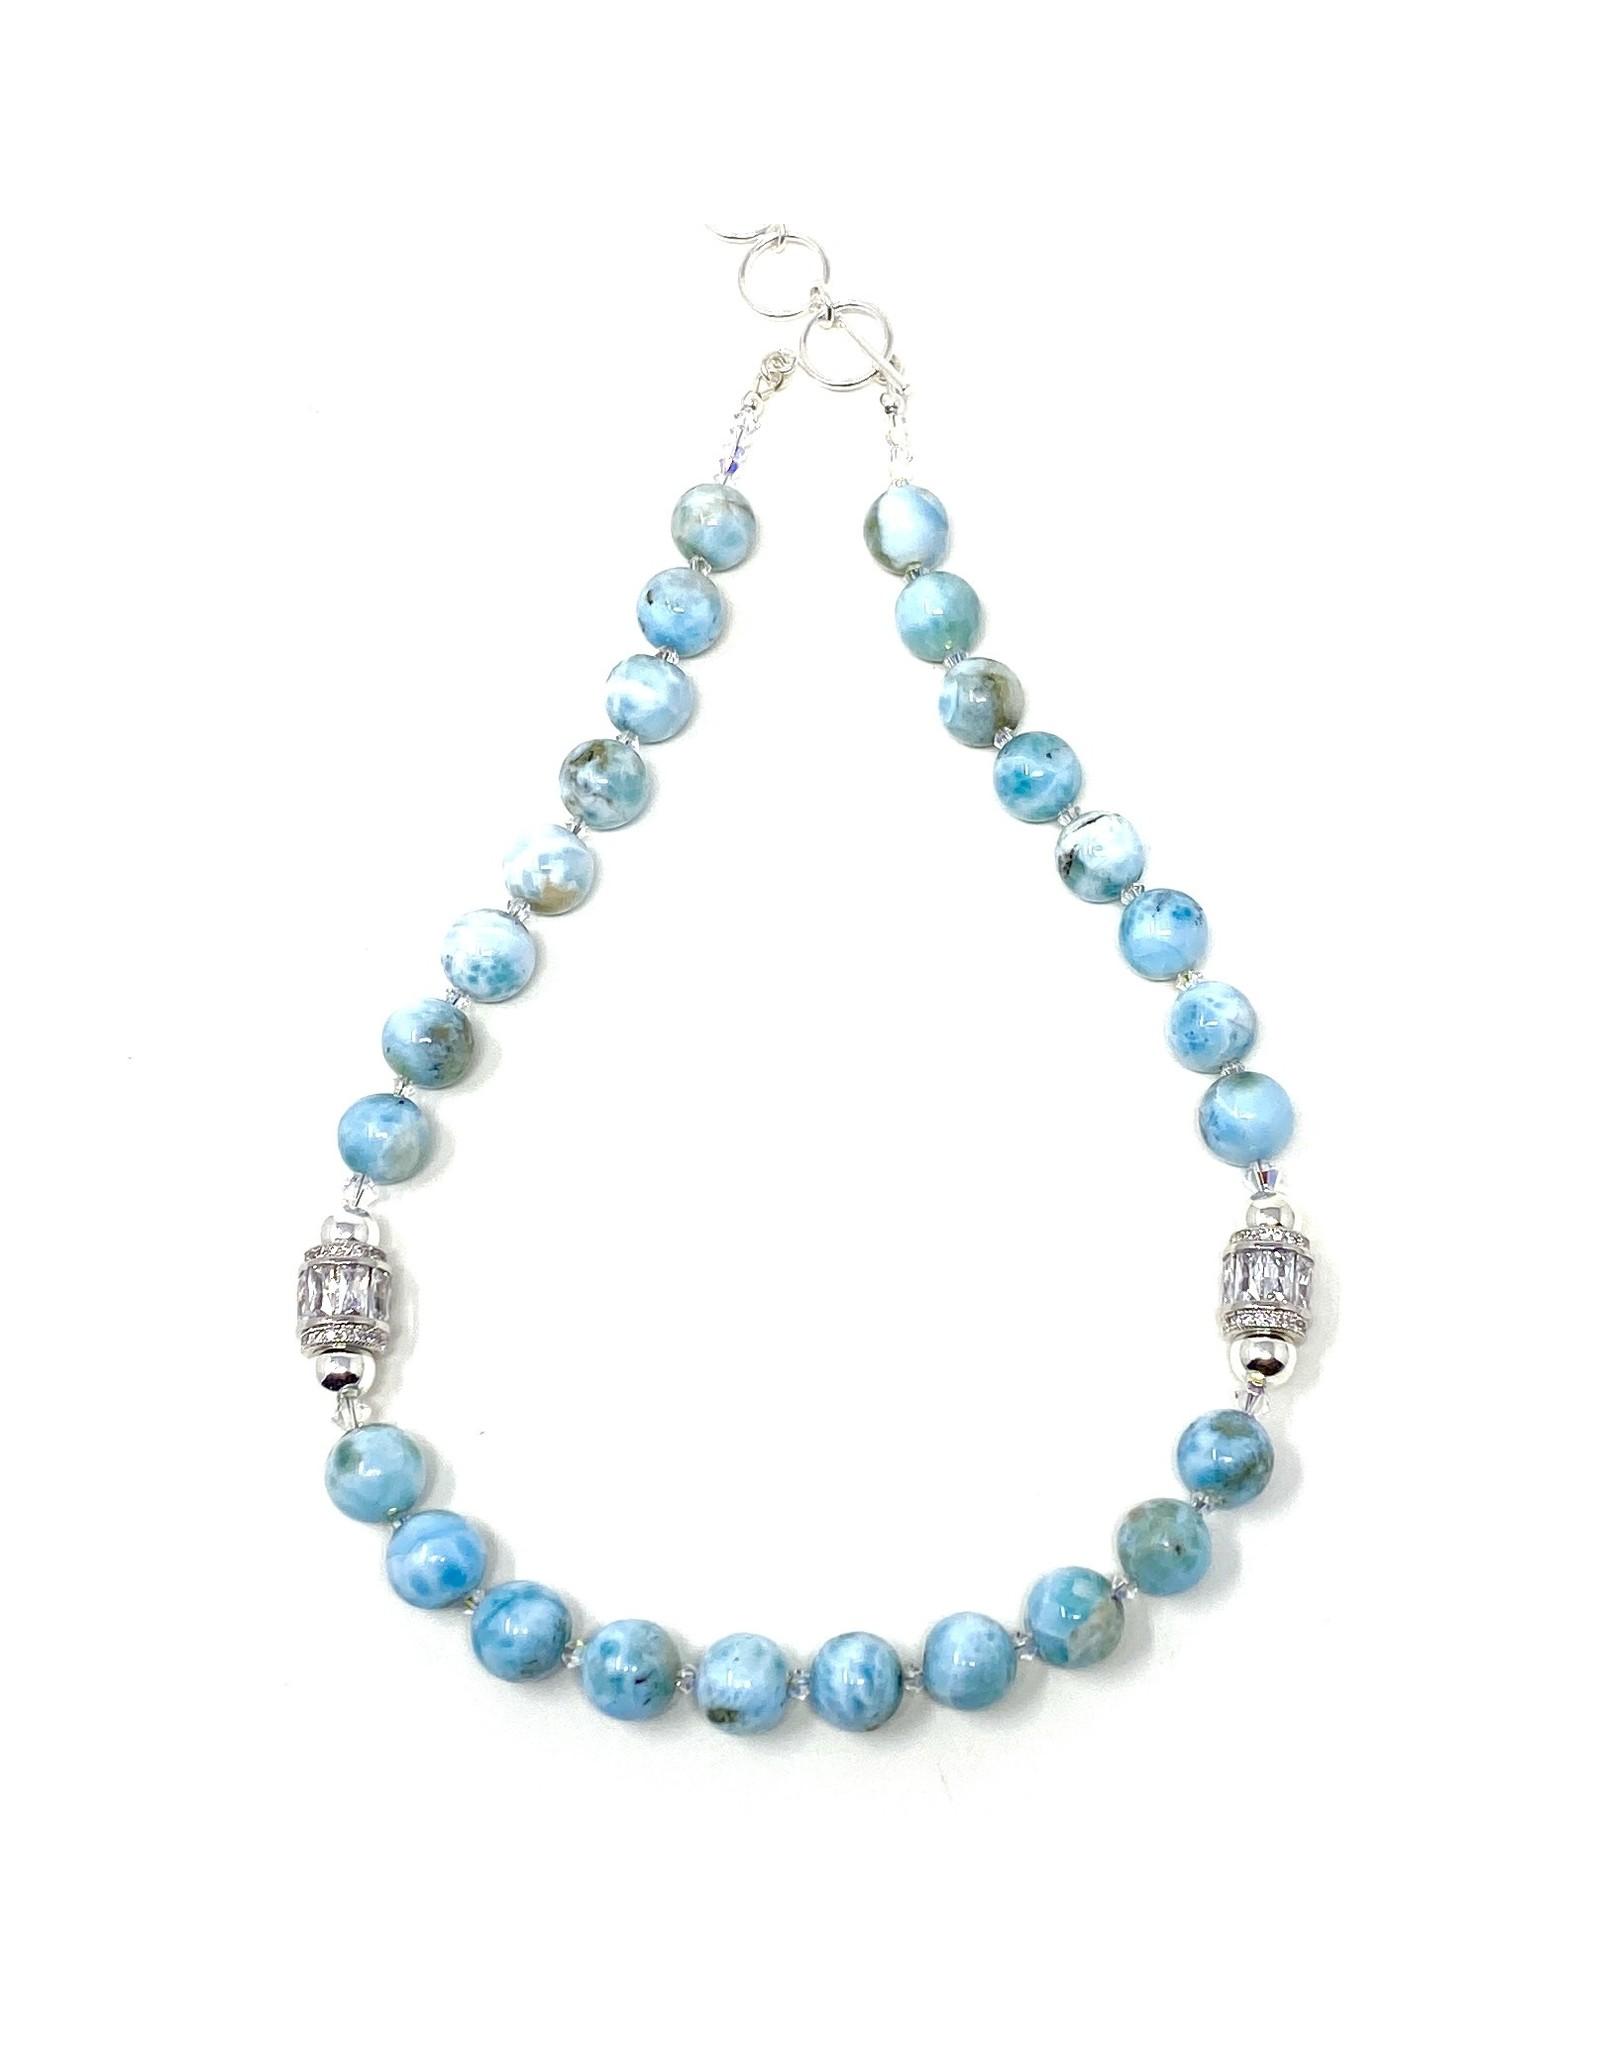 Round Larimar Necklace